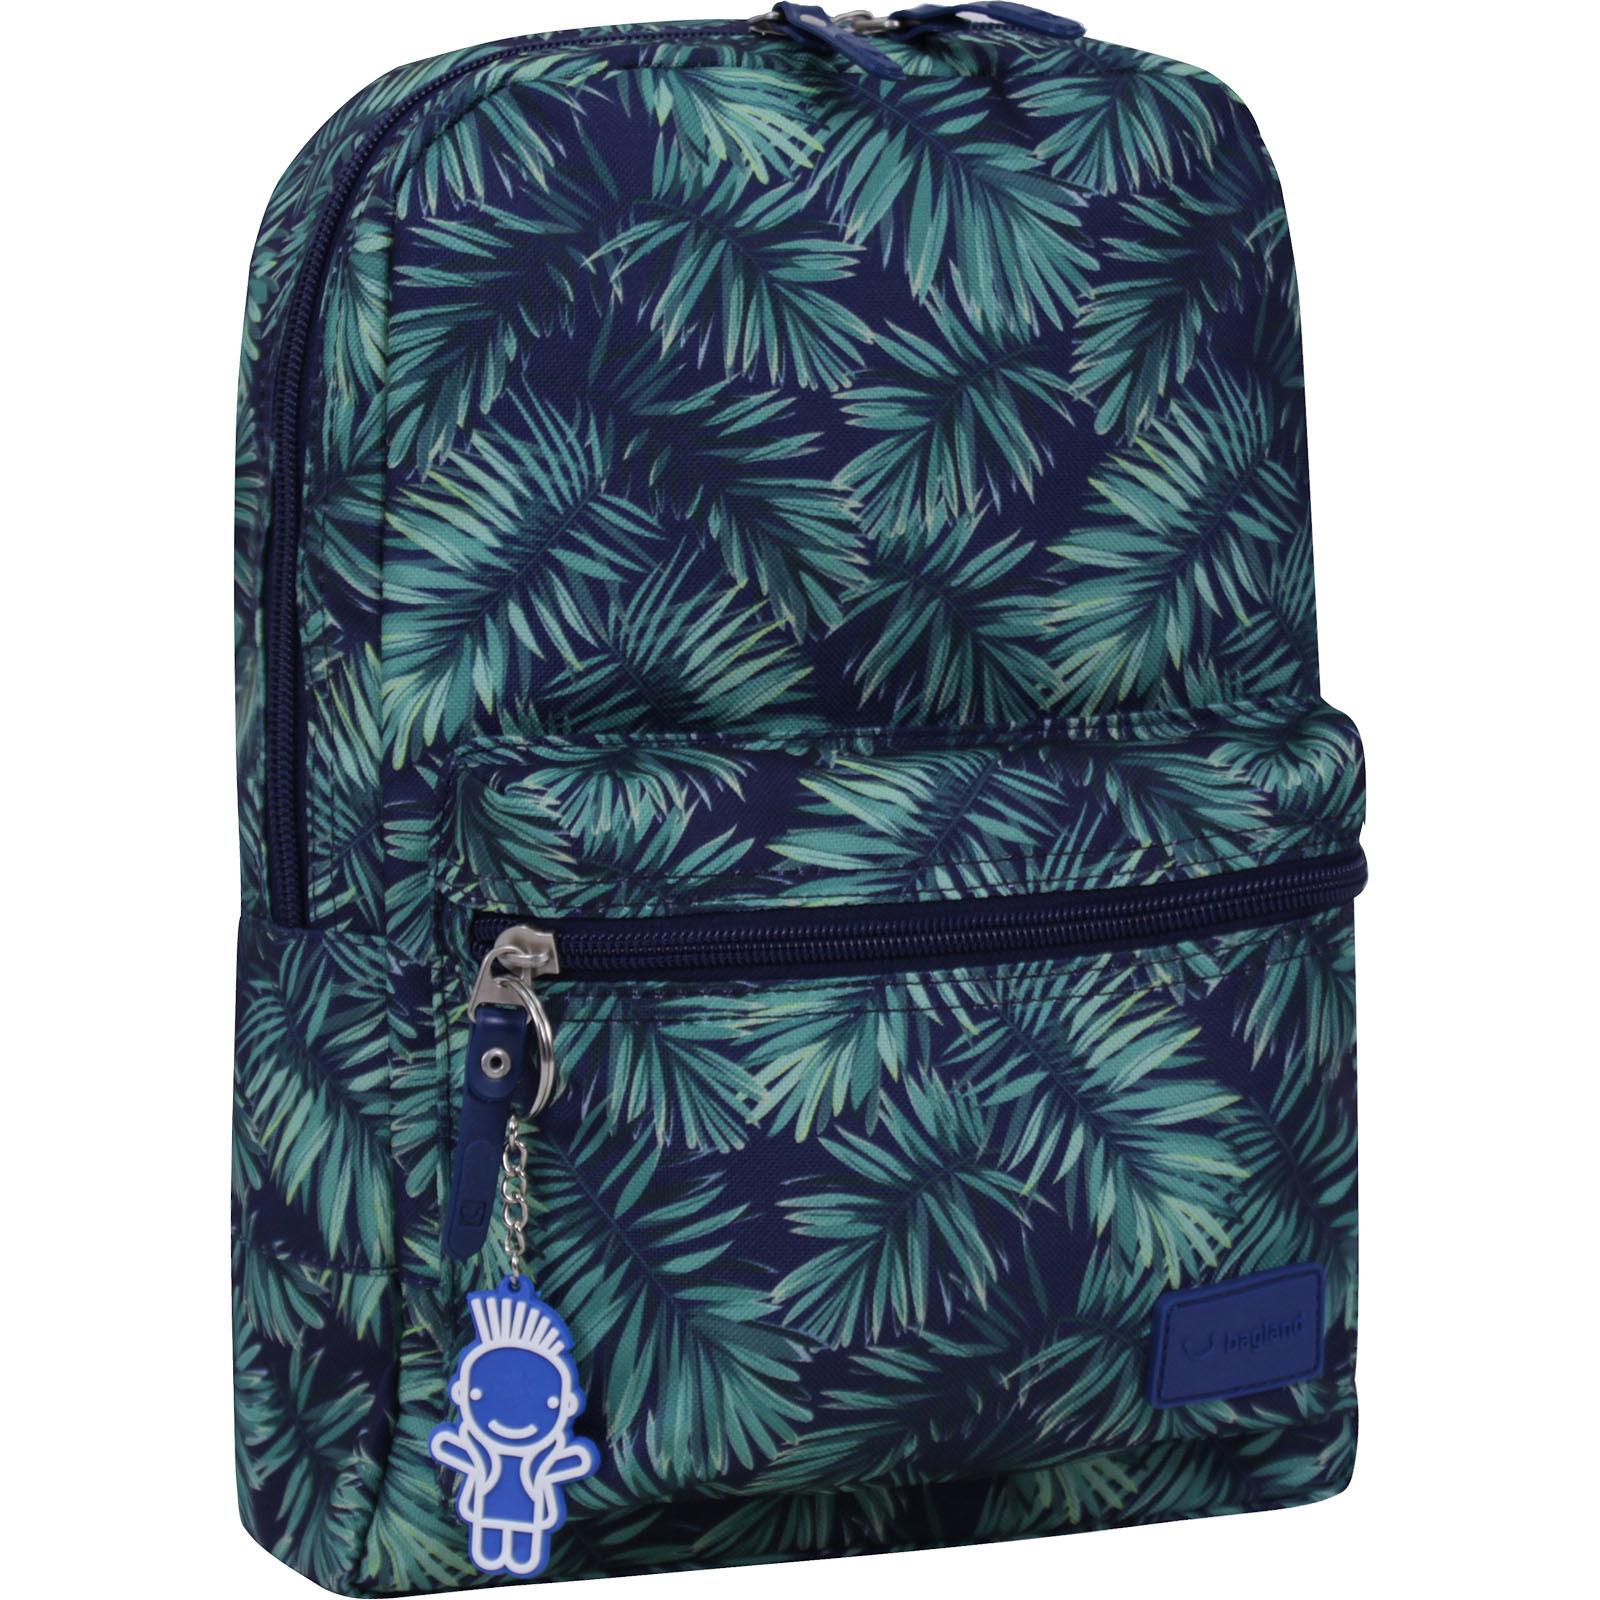 Детские рюкзаки Рюкзак Bagland Молодежный mini 8 л. сублімація 456 (00508664) IMG_8214суб456-1600.jpg